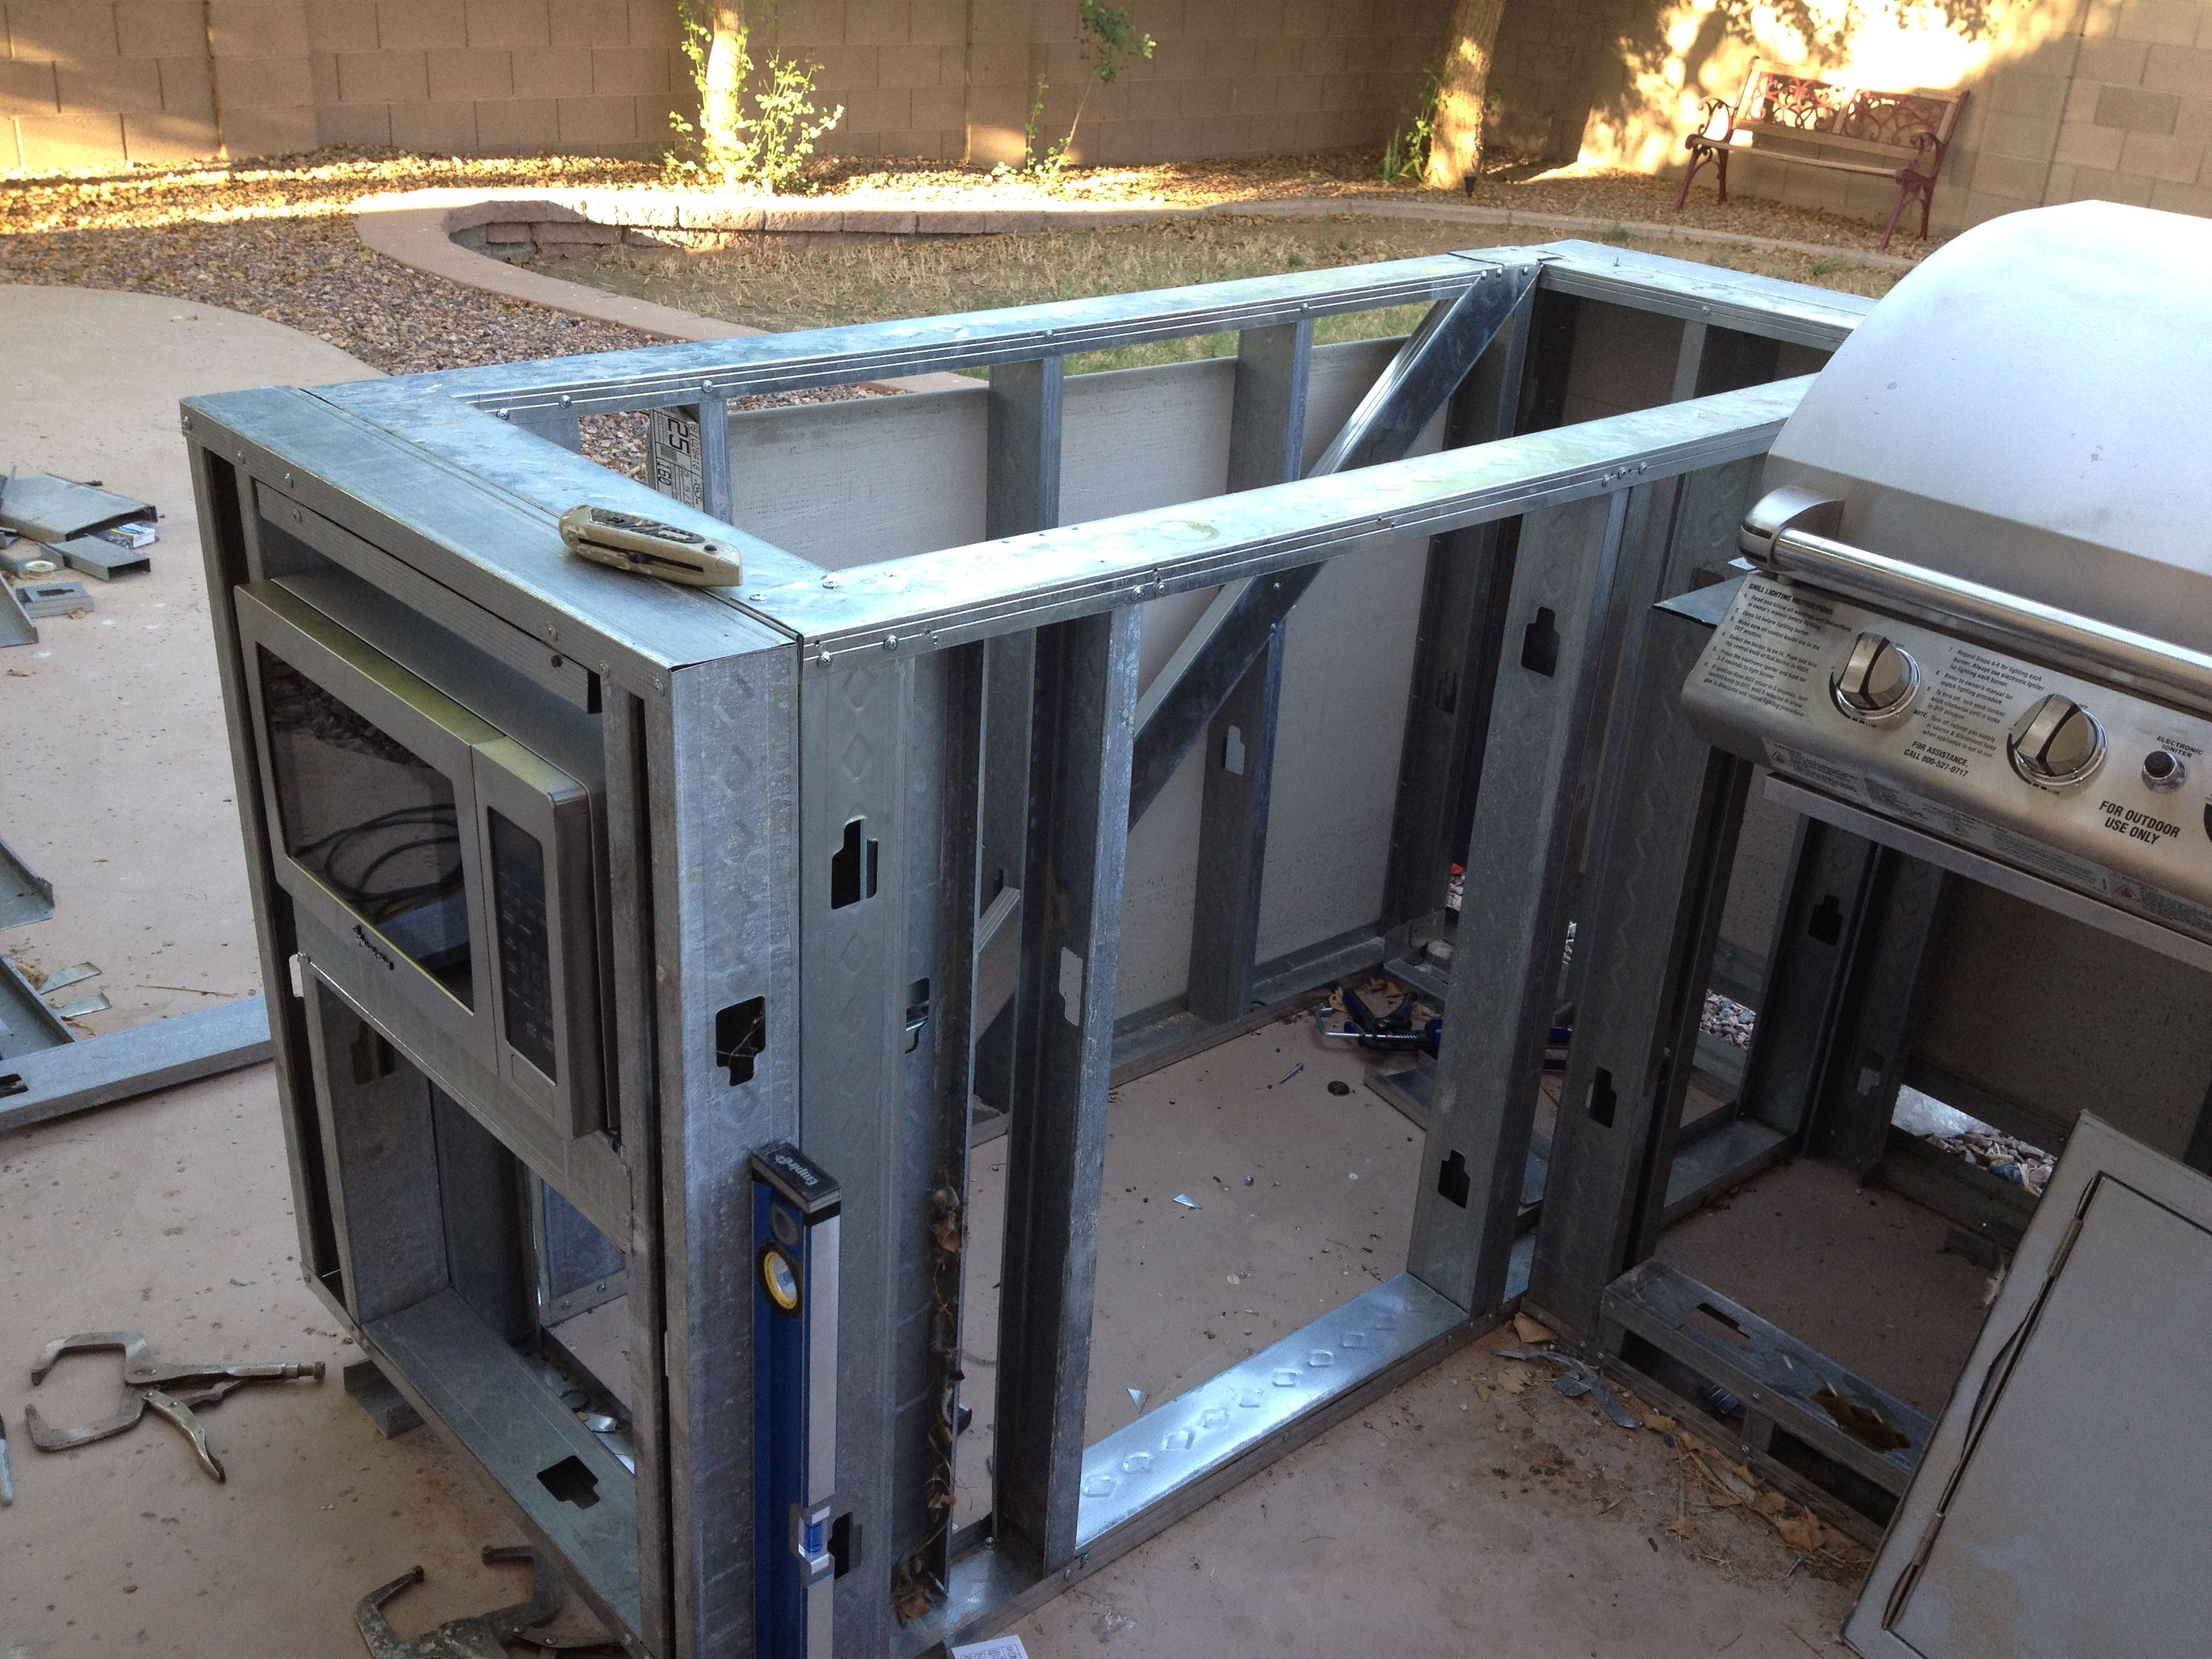 metal frame outdoor kitchen breakfast nook ideas for small steele studs diy pinterest kitchens